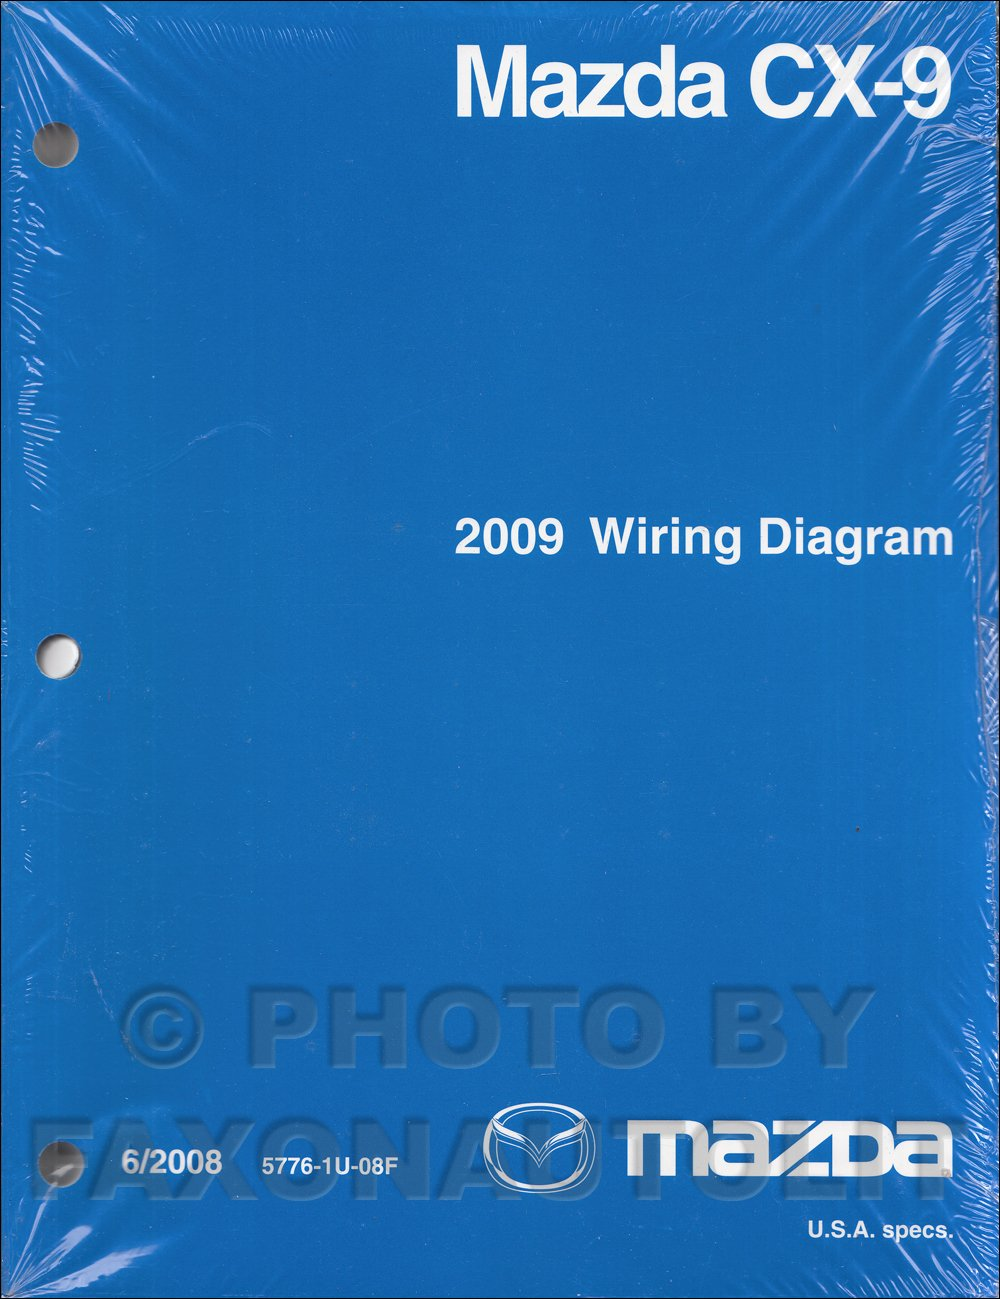 2009 mazda cx-9 wiring diagram manual original paperback – 2009